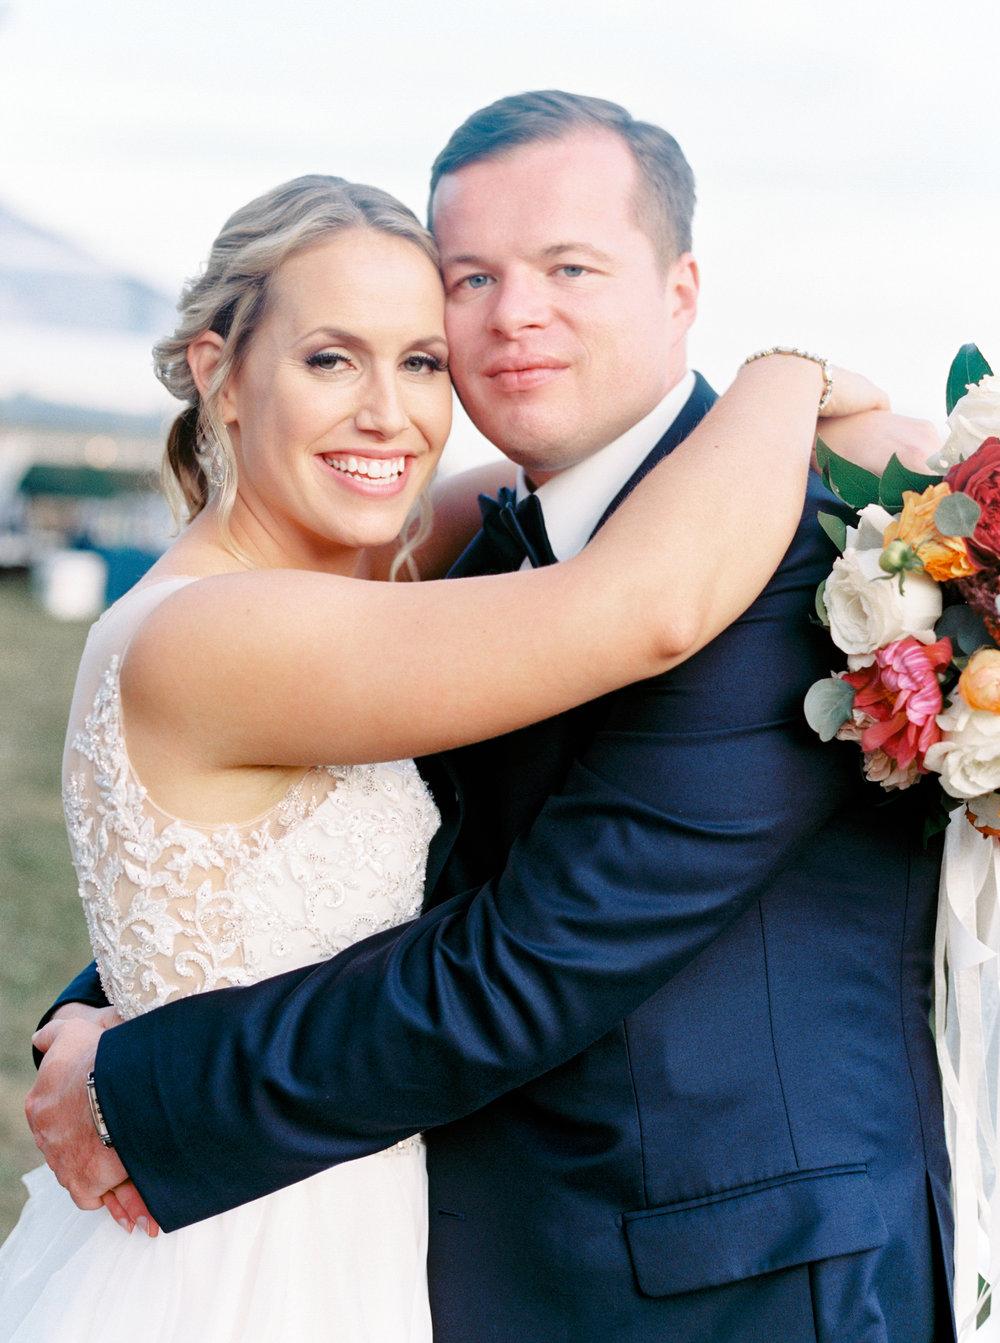 Easton_Maryland-fall-backyard-wedding-photographer-Richmond-natalie-jayne-photography-image-13-2.jpg